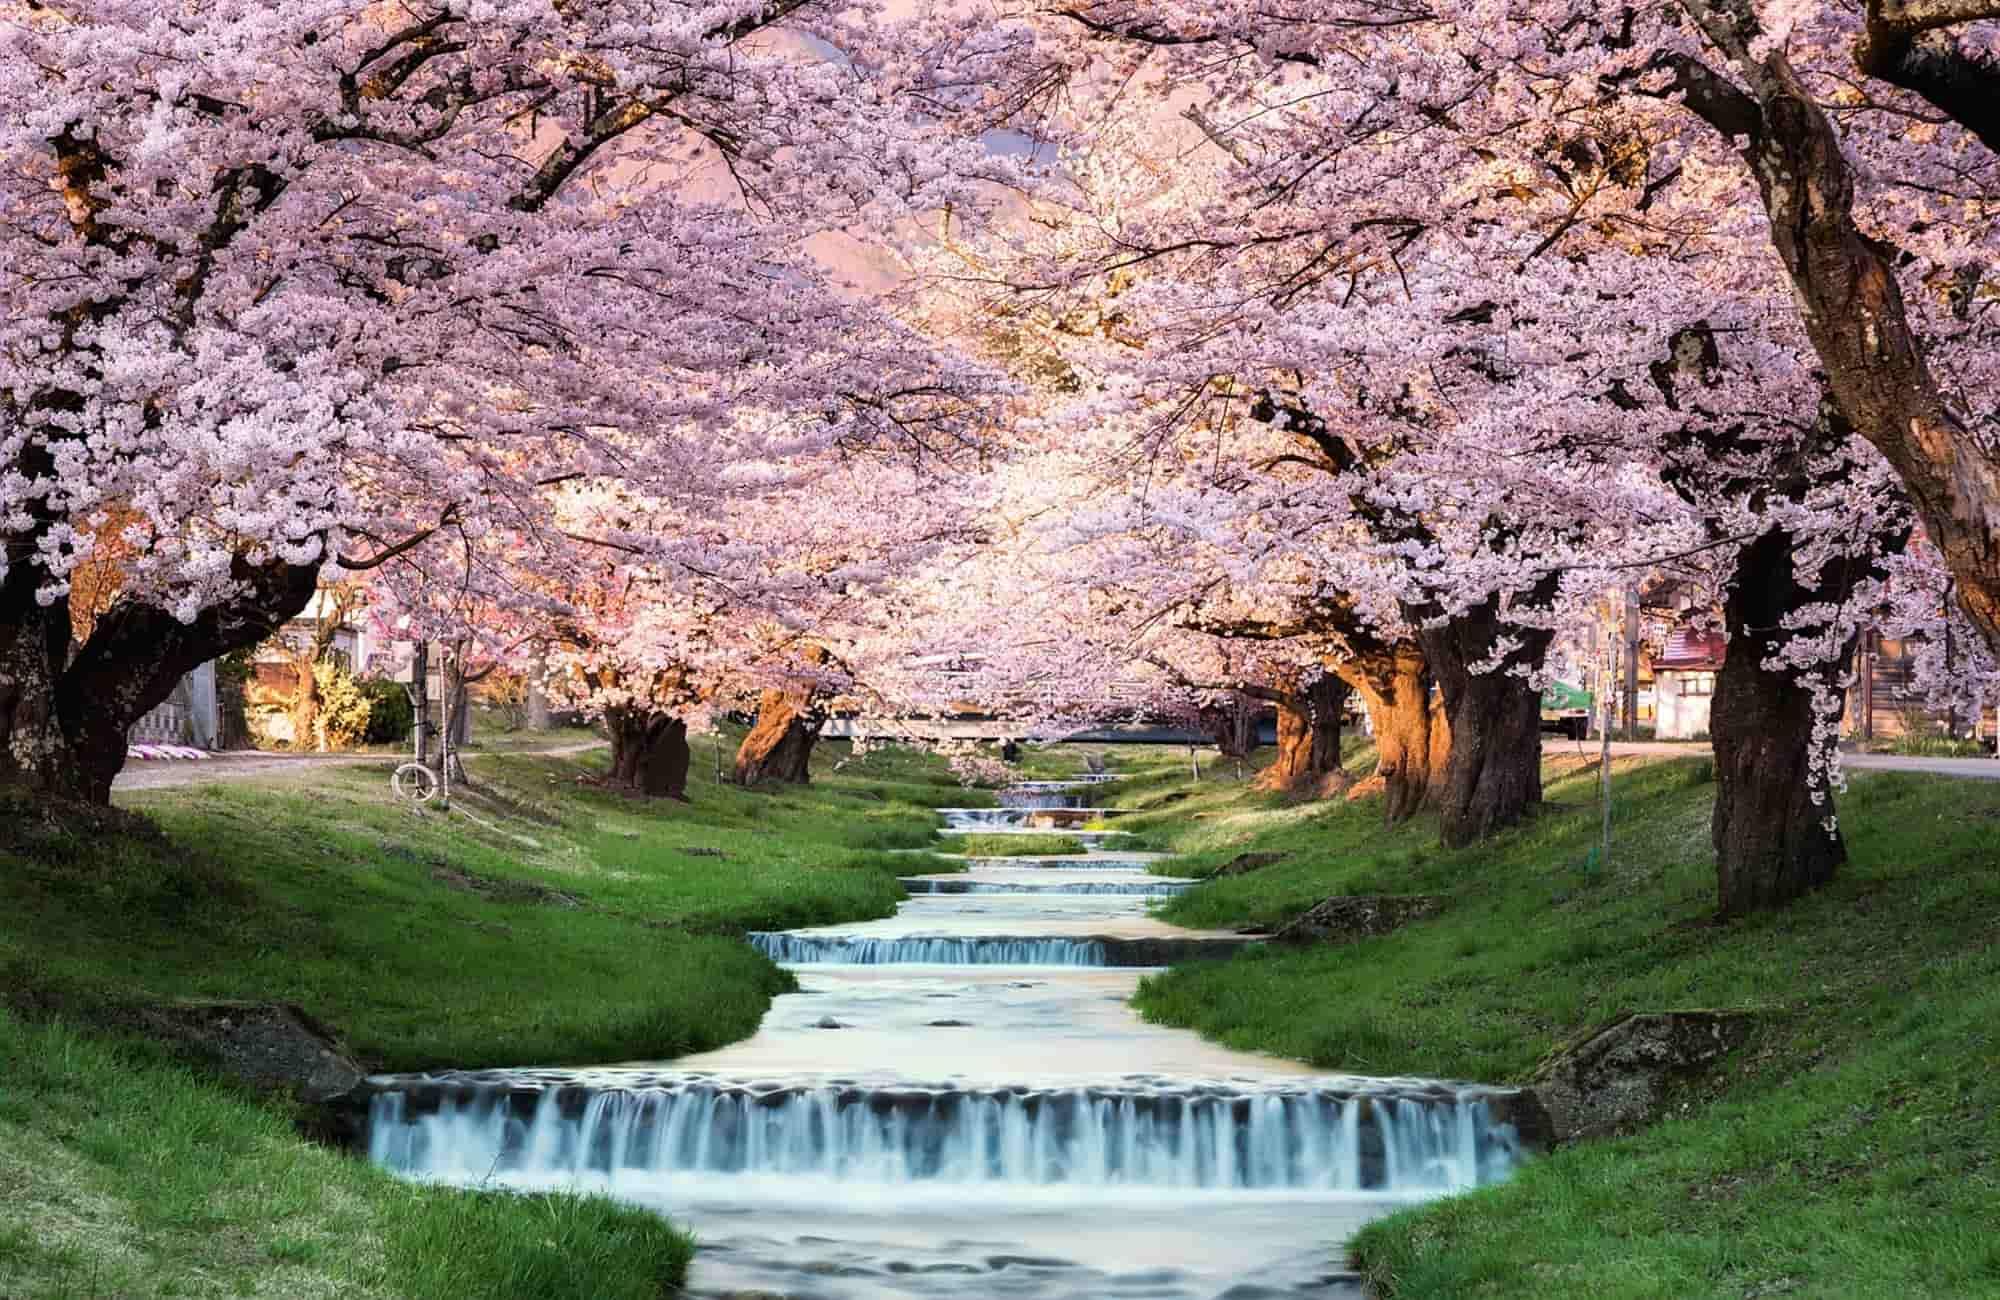 Voyage Japon printemps - Fukushima - Amplitudes